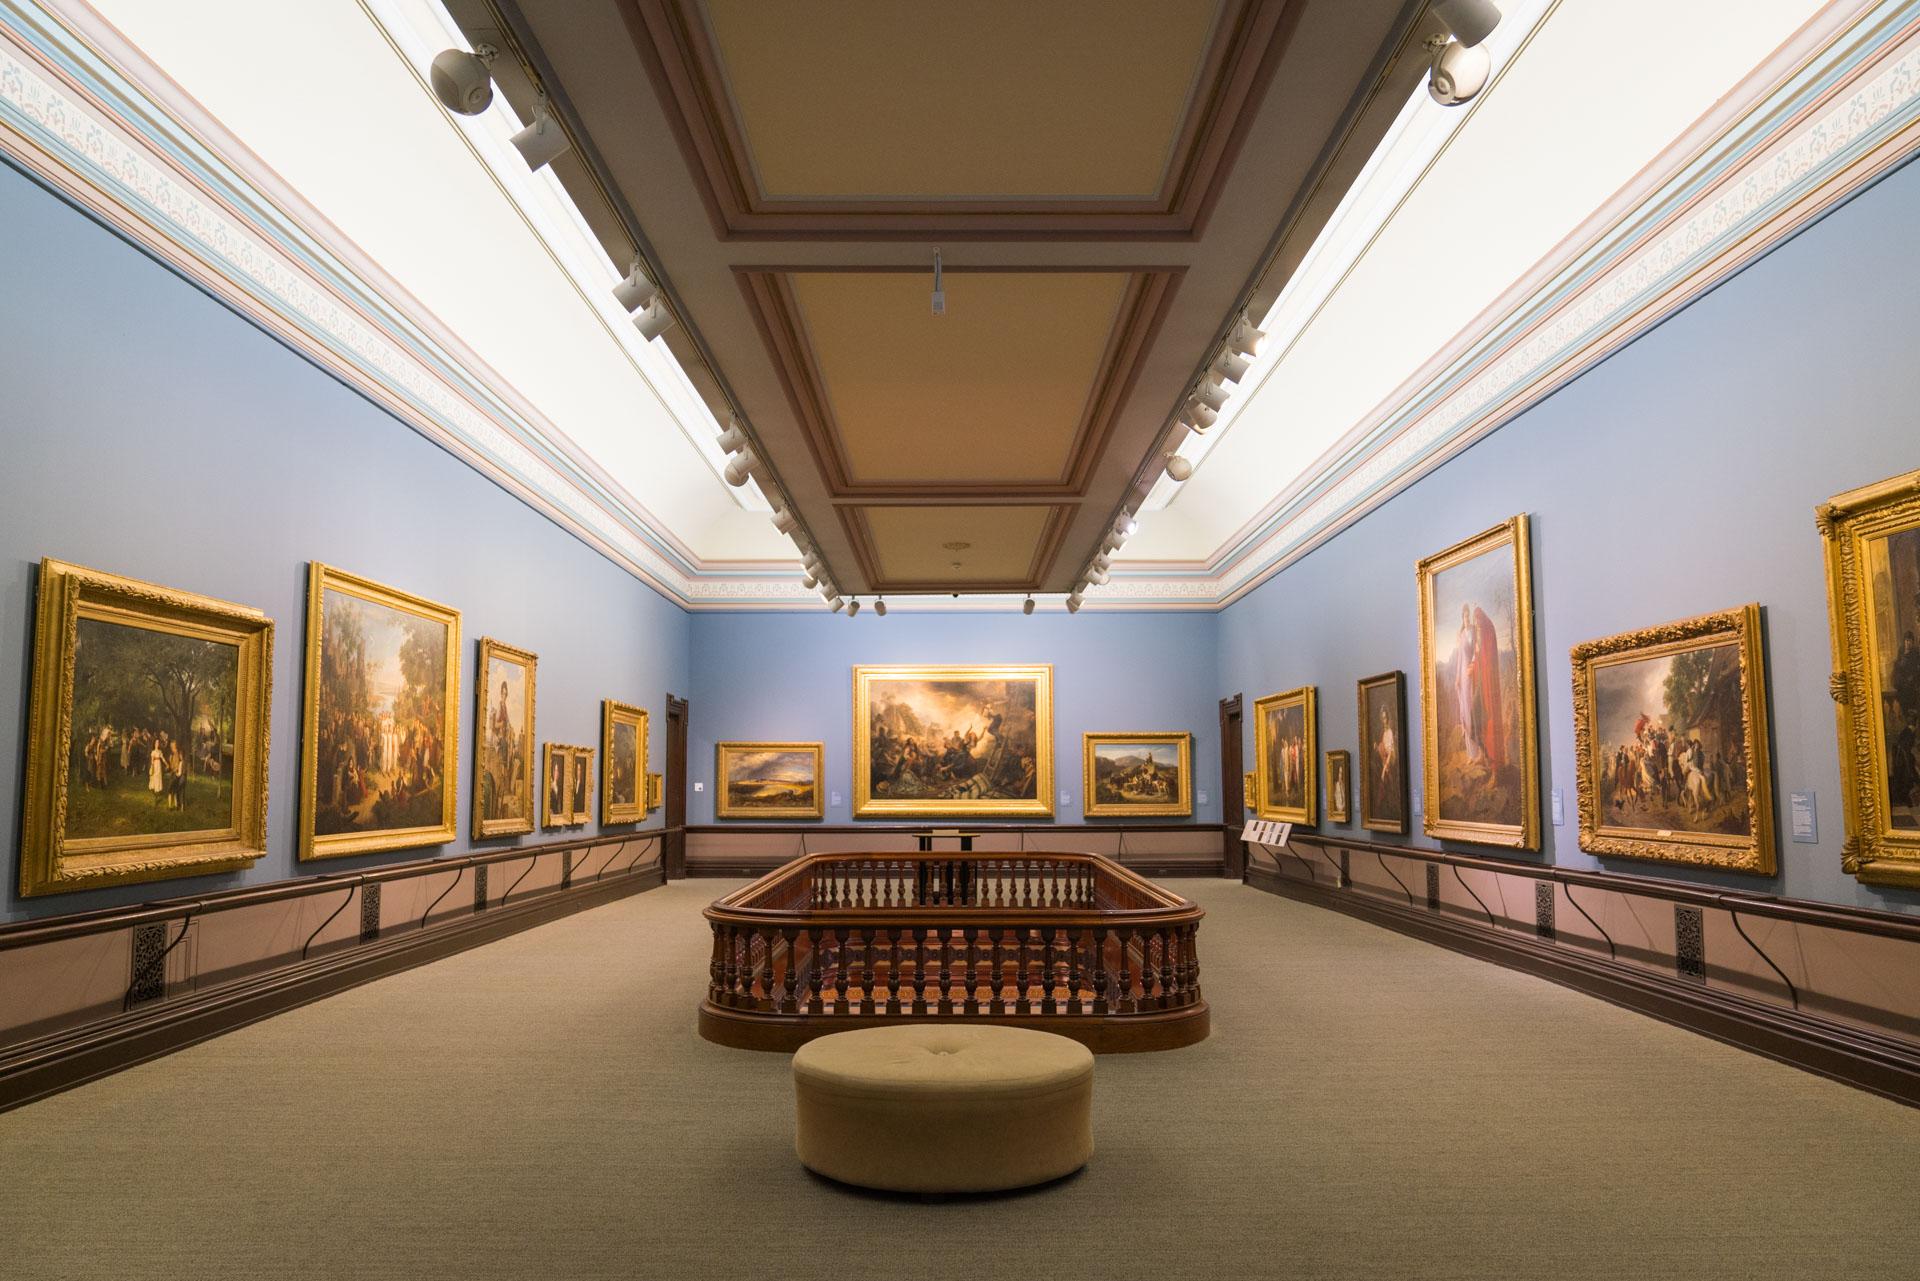 Interior of Crocker Art Museum in Sacramento CA